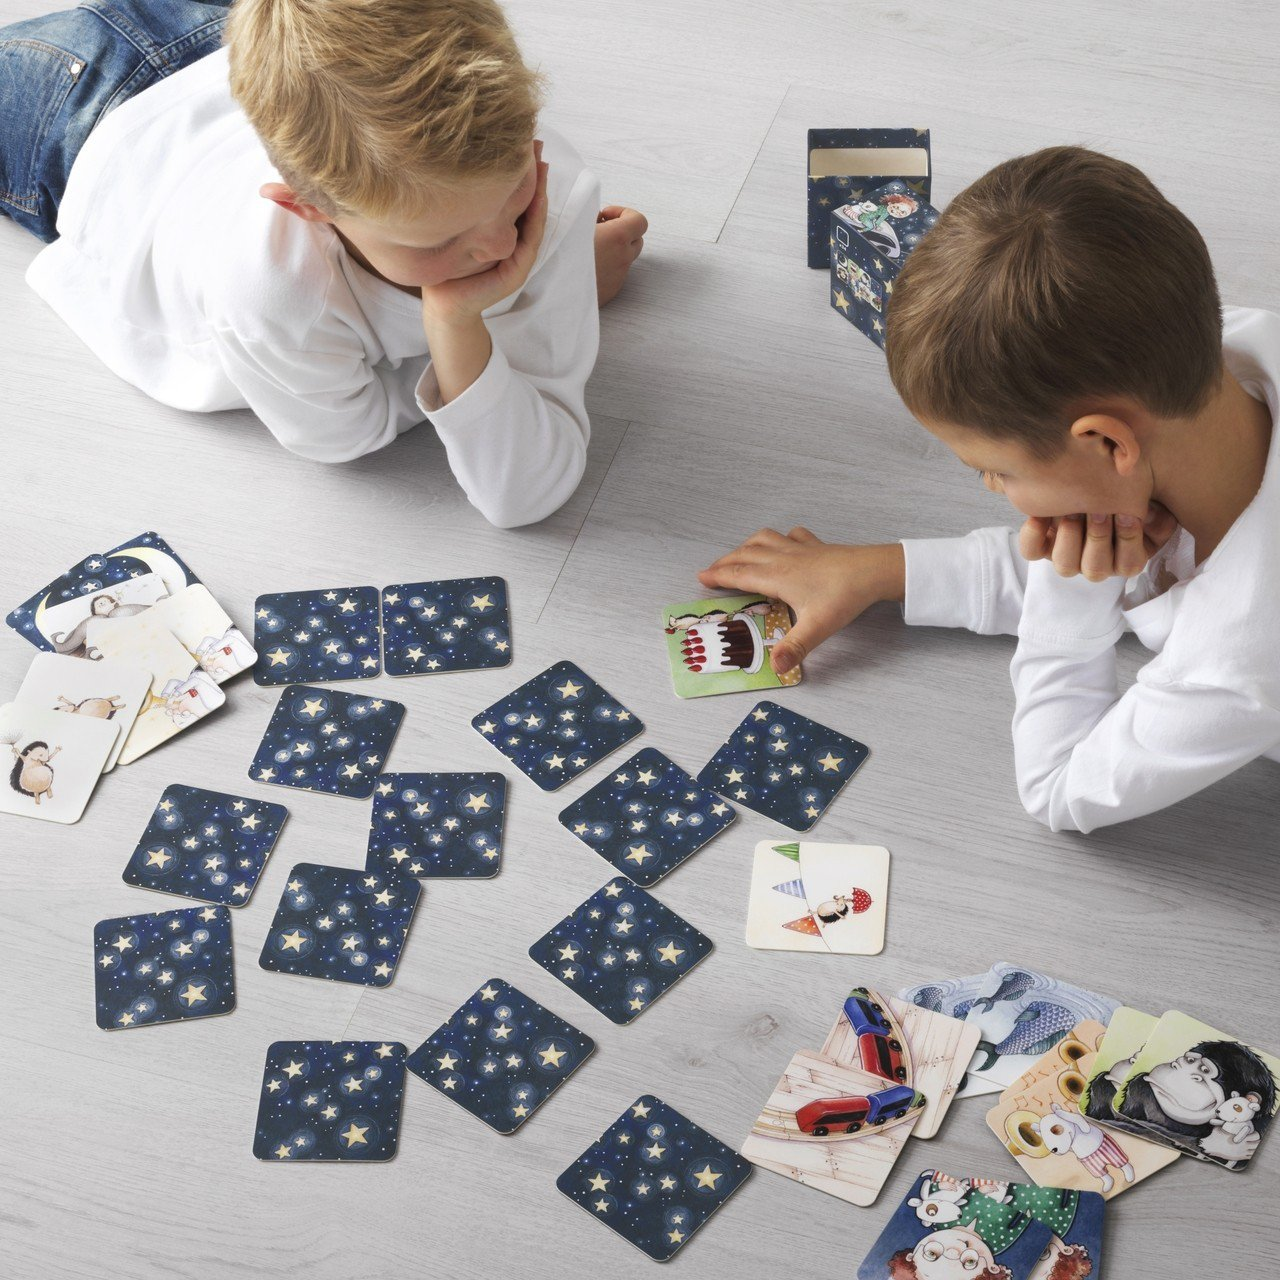 LILLABO紙牌遊戲,原價129元、特價49元。圖/IKEA提供